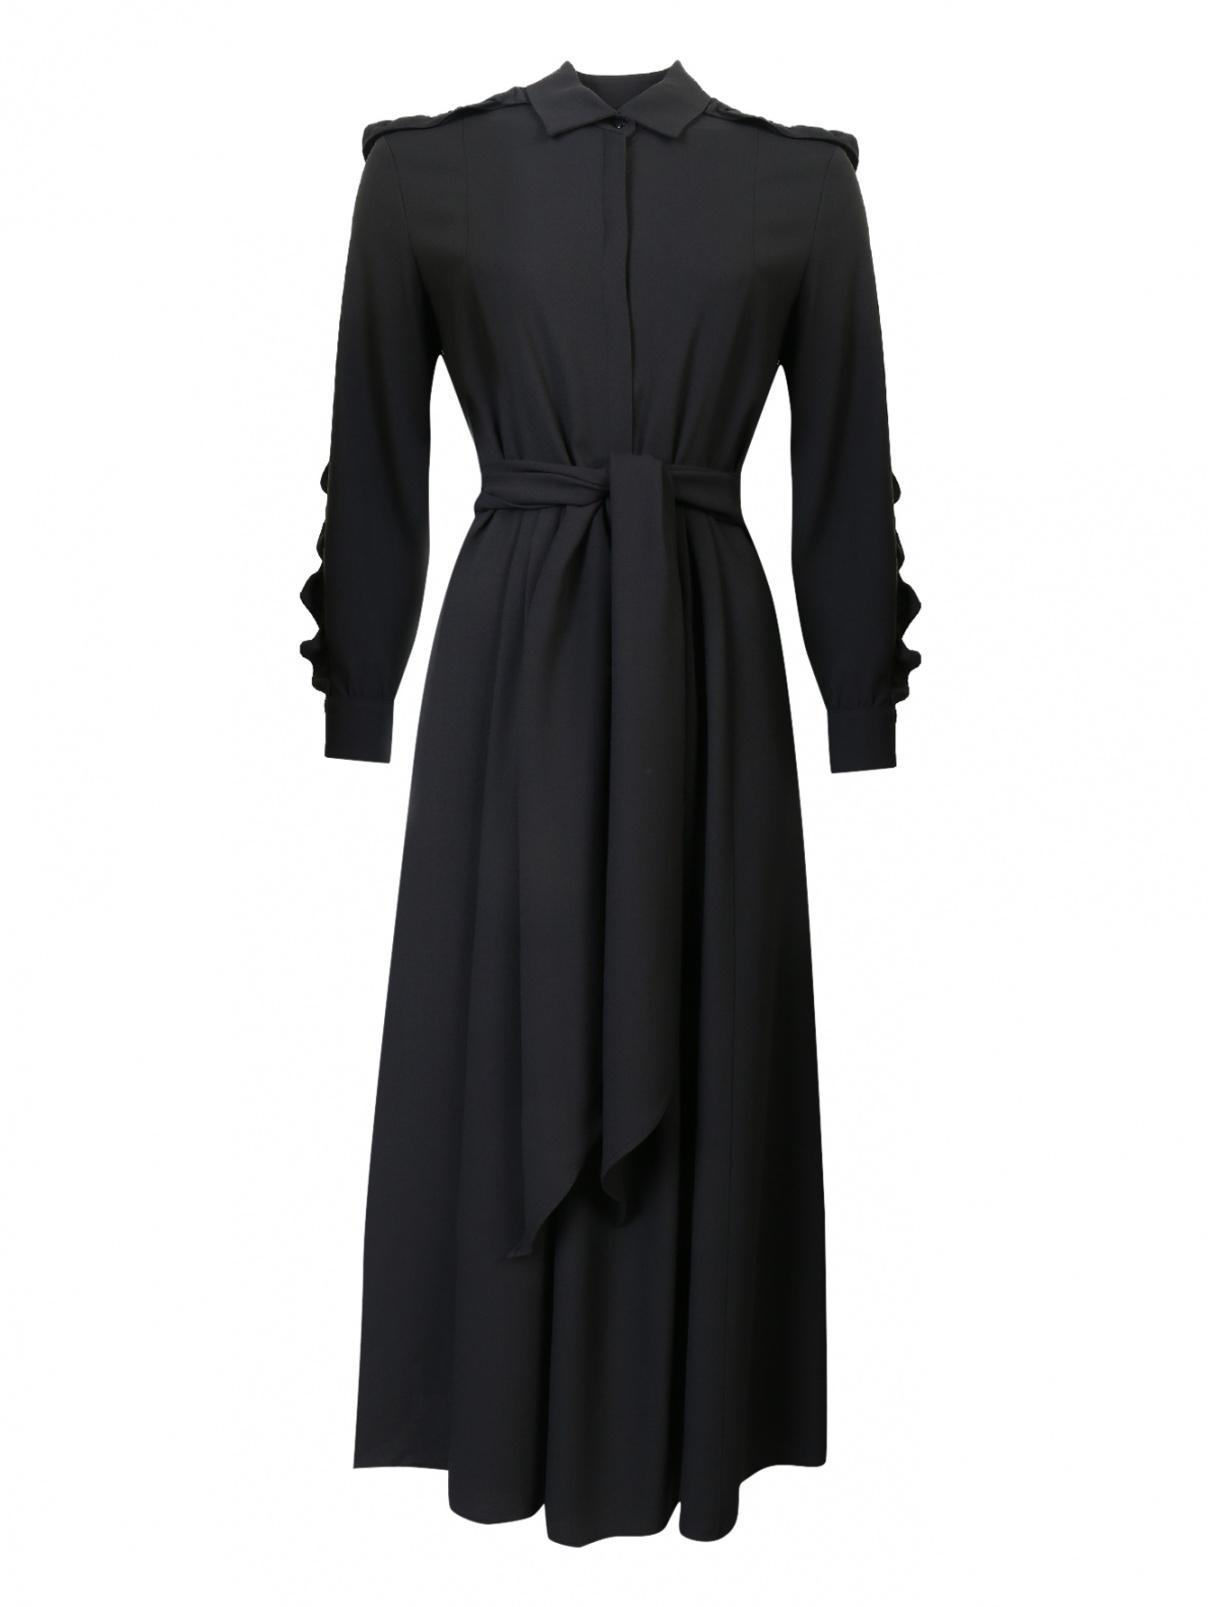 Платье с оборками на рукавах Weekend Max Mara  –  Общий вид